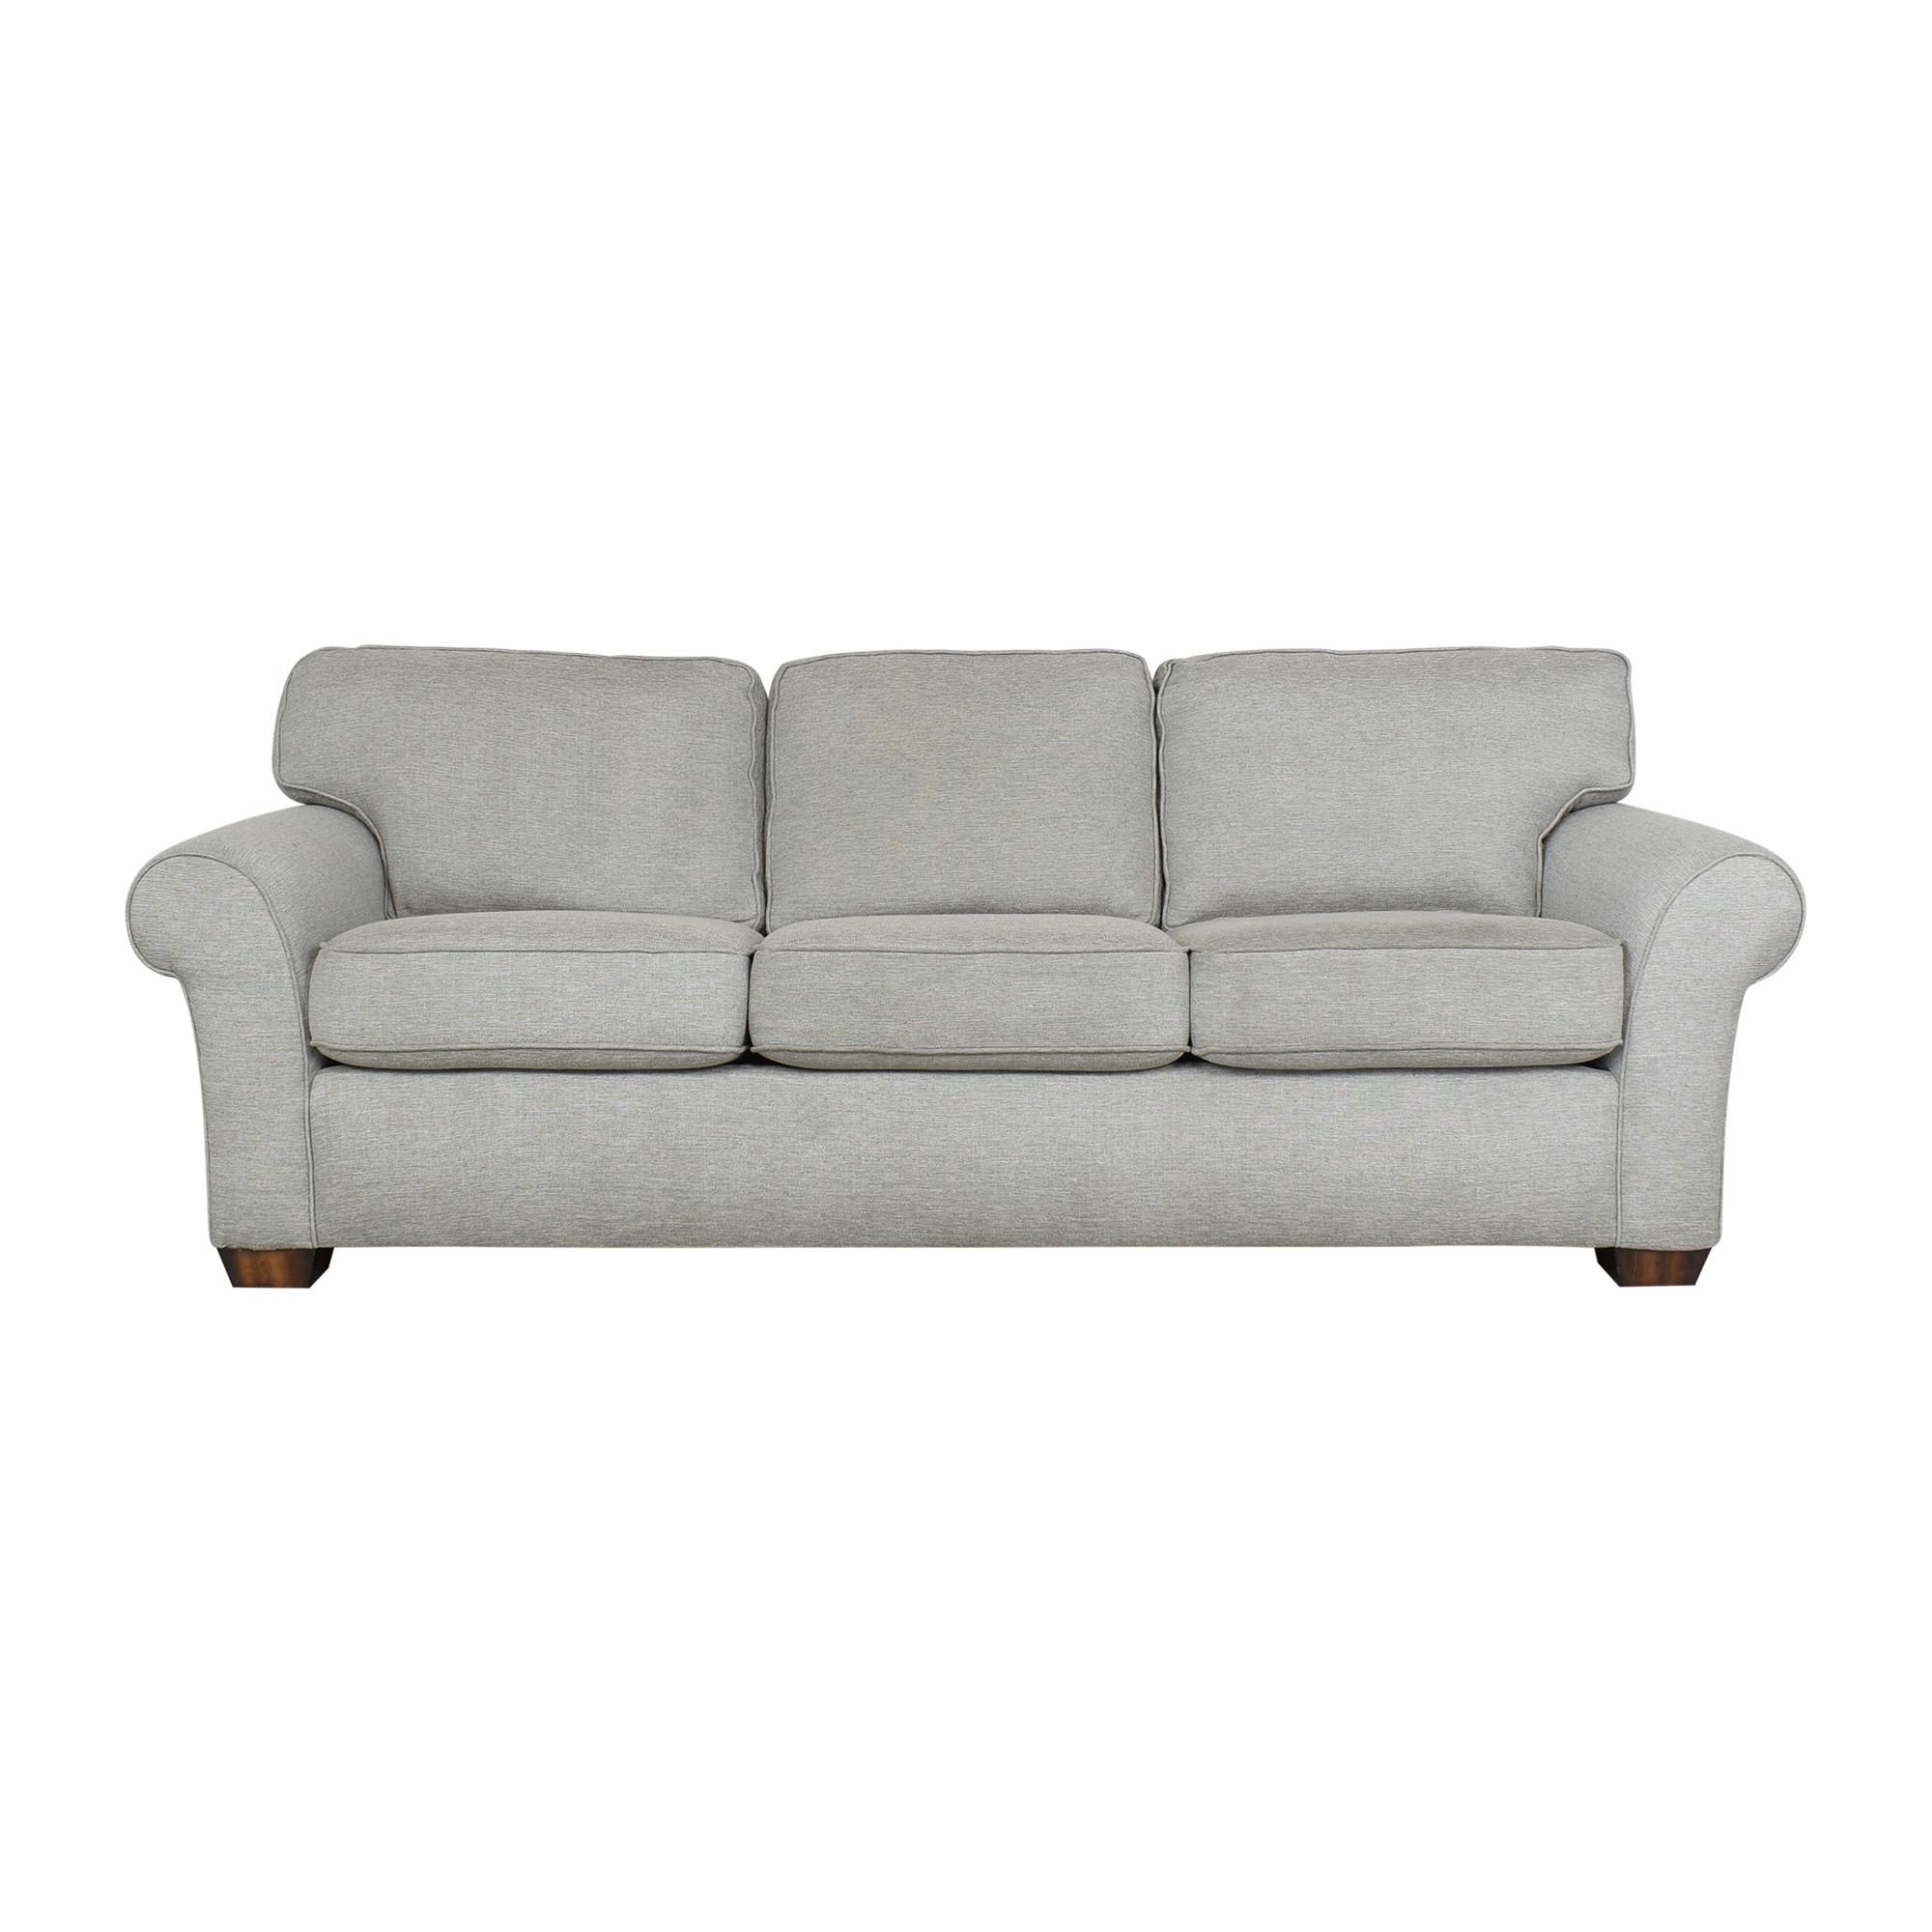 Flexsteel Raymour & Flanigan Tenley Sofa by Flexsteel ct